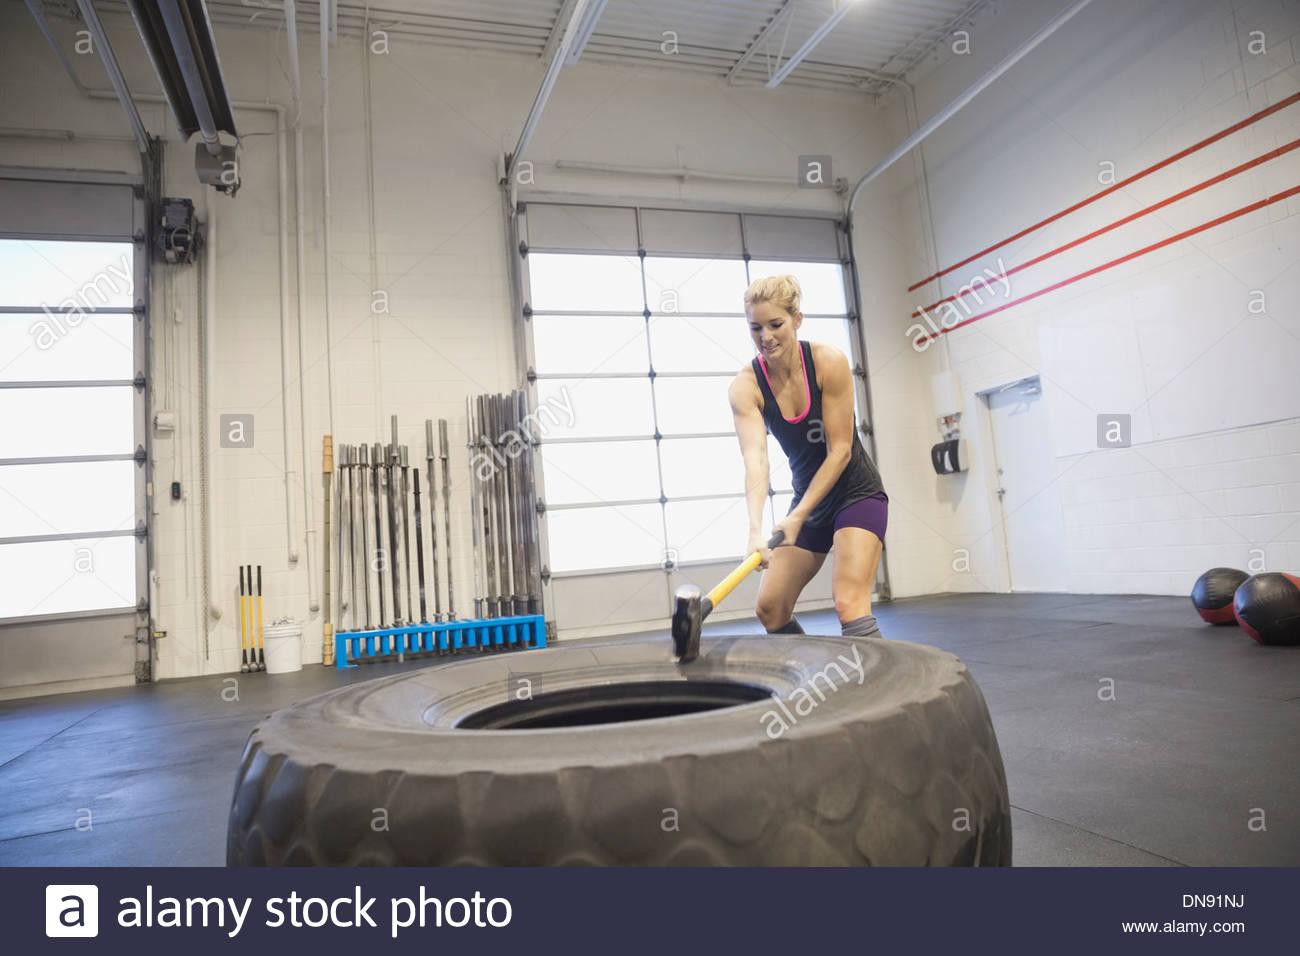 Female athlete hammering truck tire - Stock Image